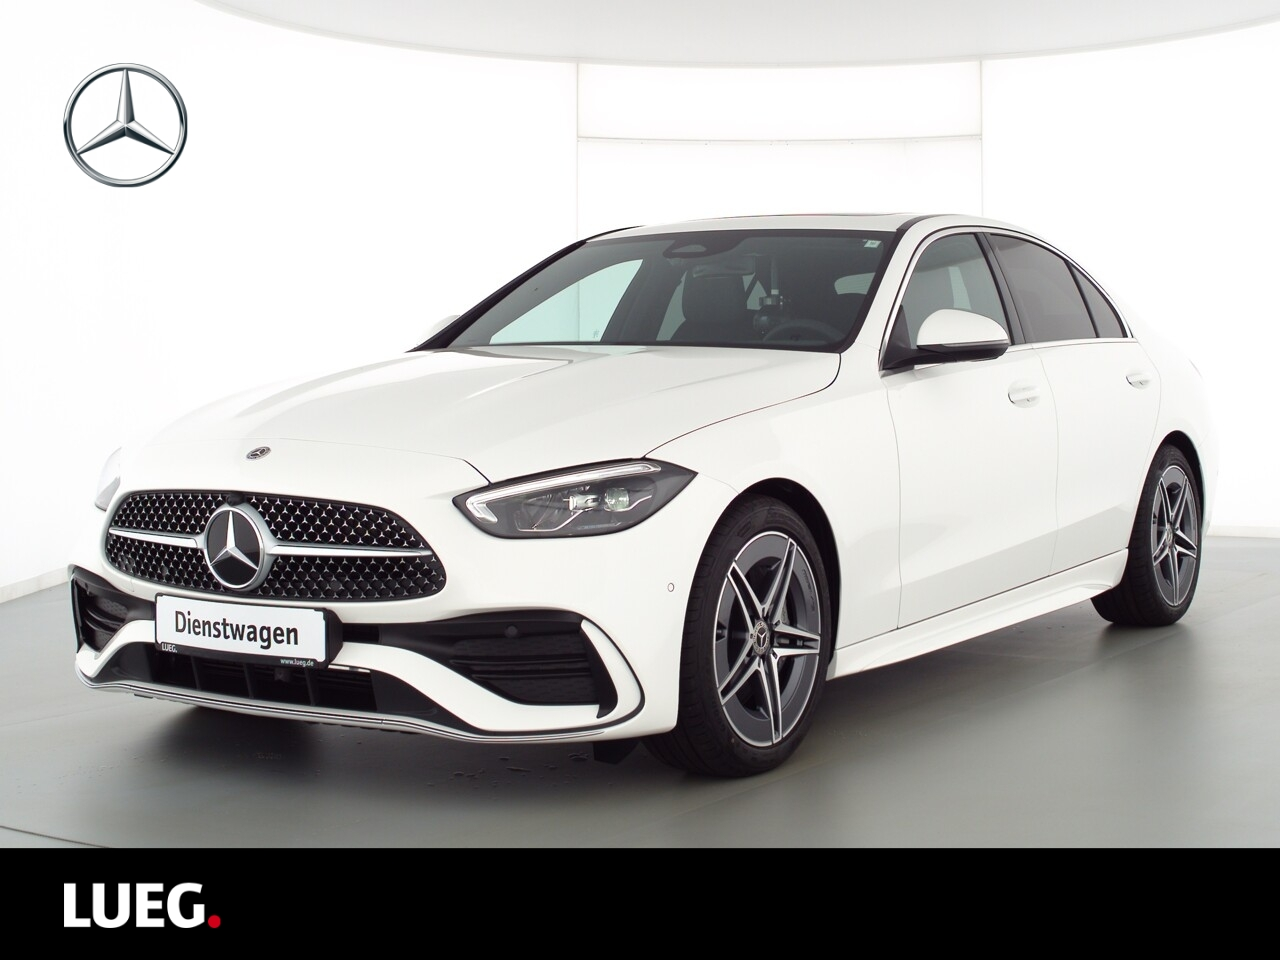 Mercedes-Benz C 200 4M AMG+SHD+TOTW+KAMERA+LED+PTS+DUNKL.GLAS, Jahr 2021, Benzin